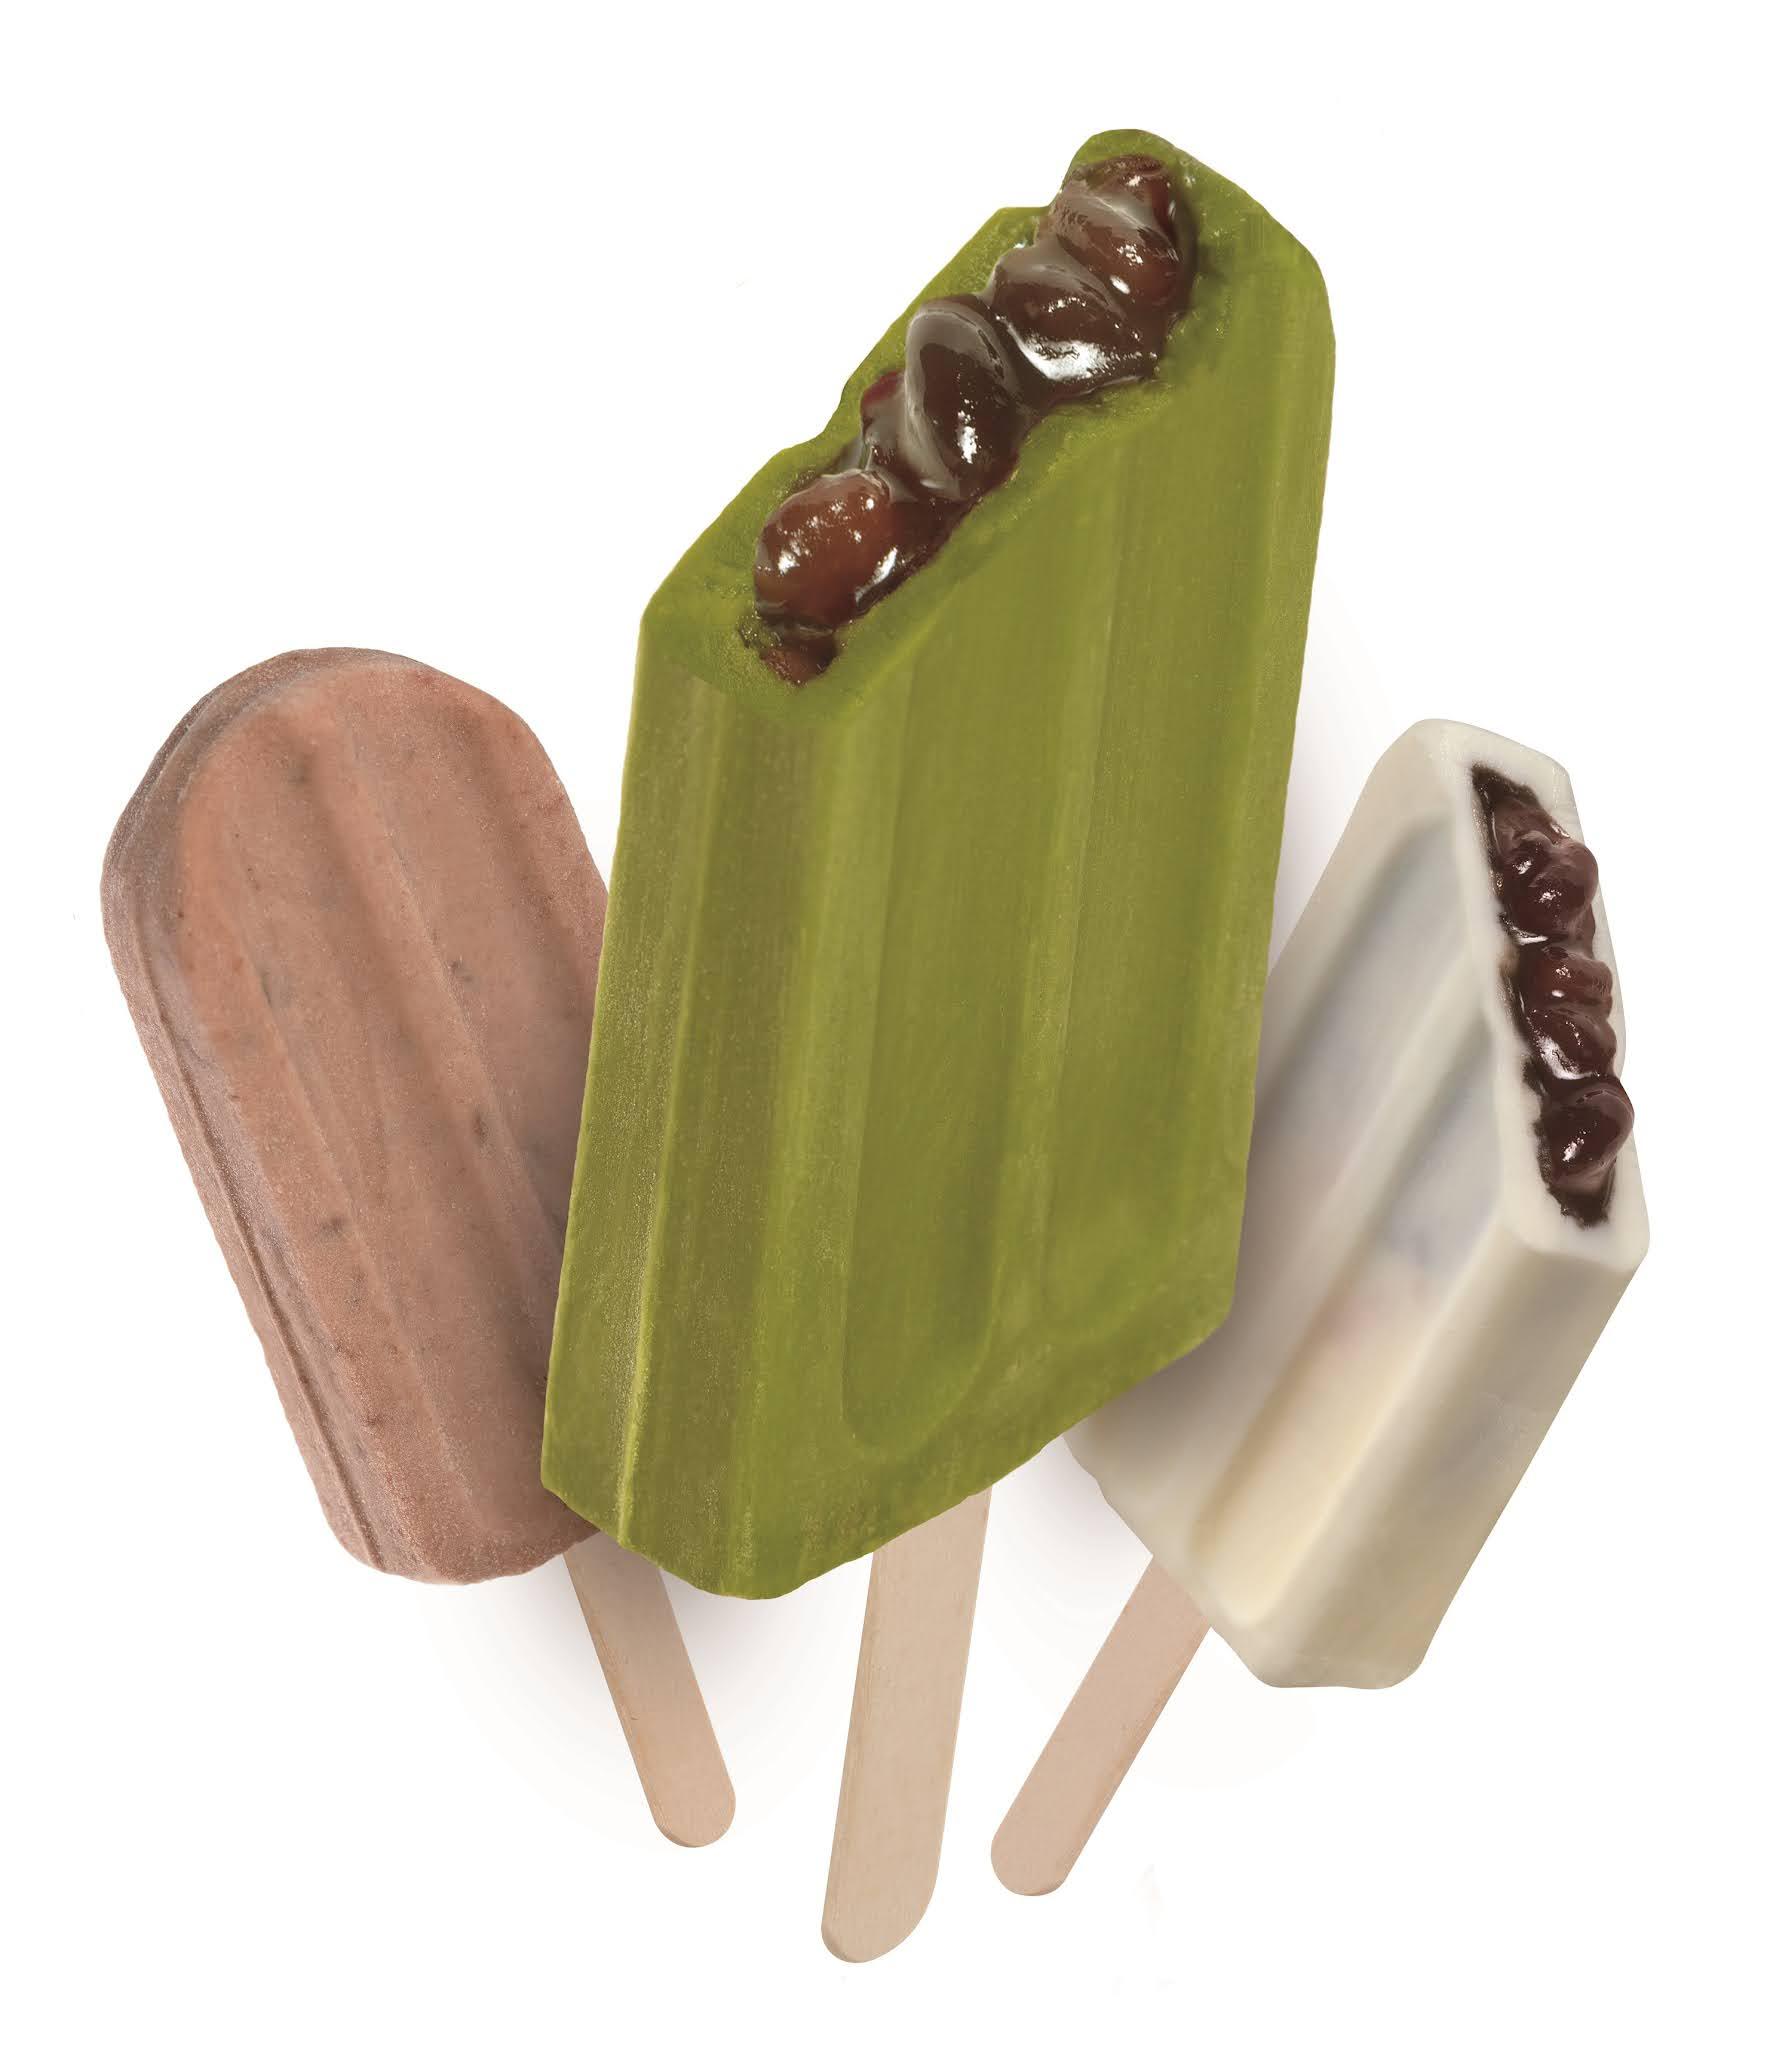 azuki bar, halal azuki bar, halal azuki bar malaysia, don don donki halal status, halal certified japanese ice cream, red beans ice cream japan,